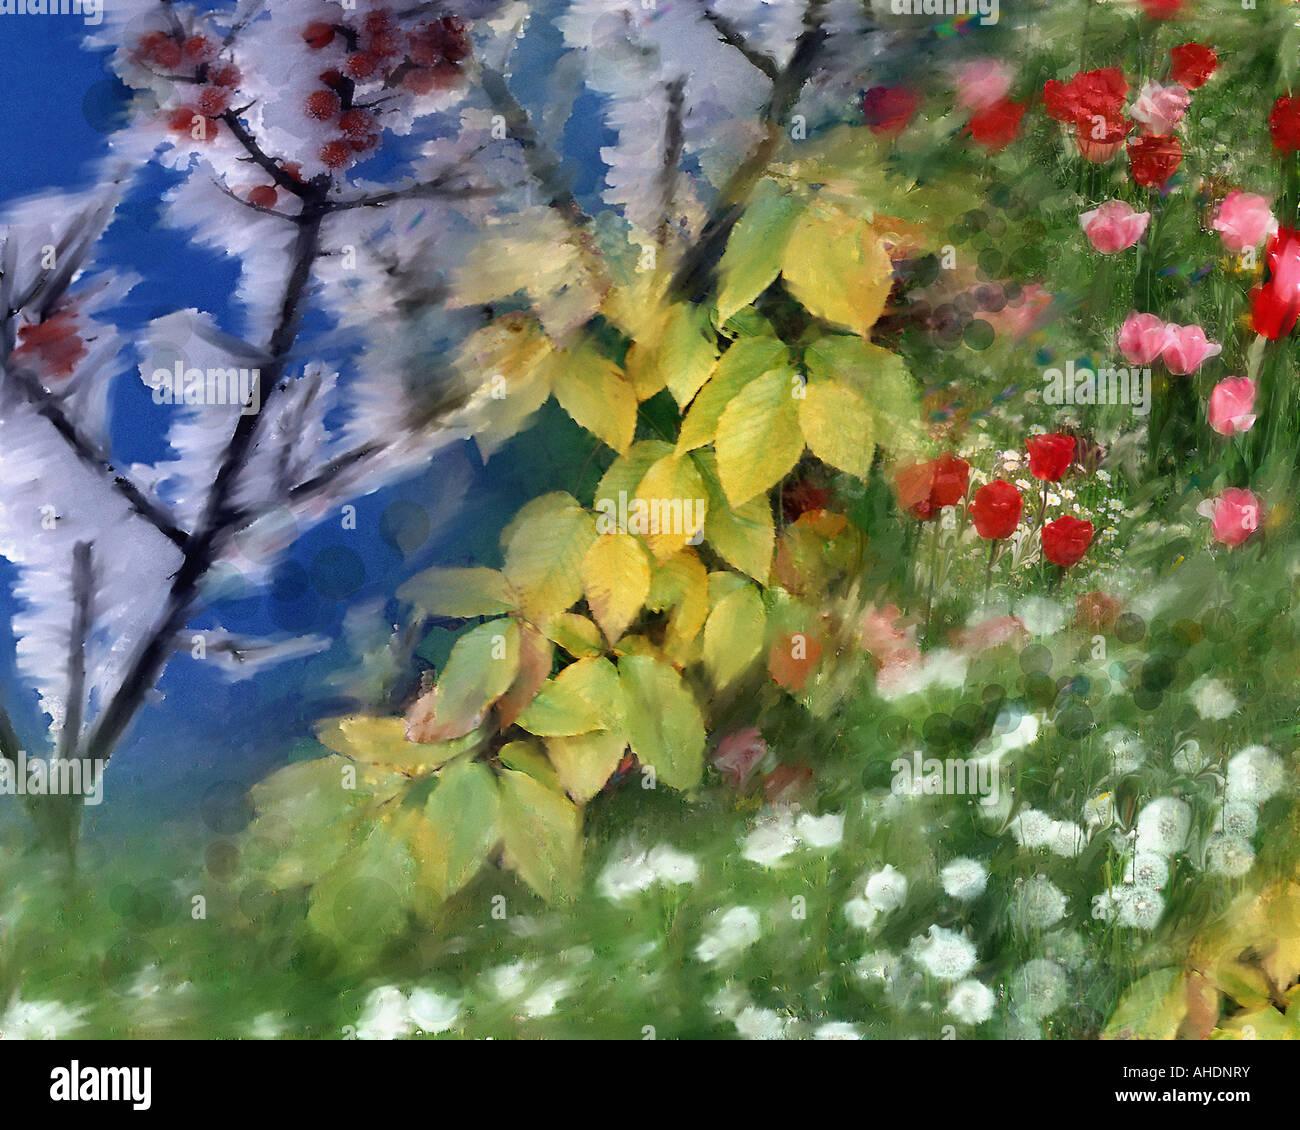 Arte Digital: Four Seasons Imagen De Stock